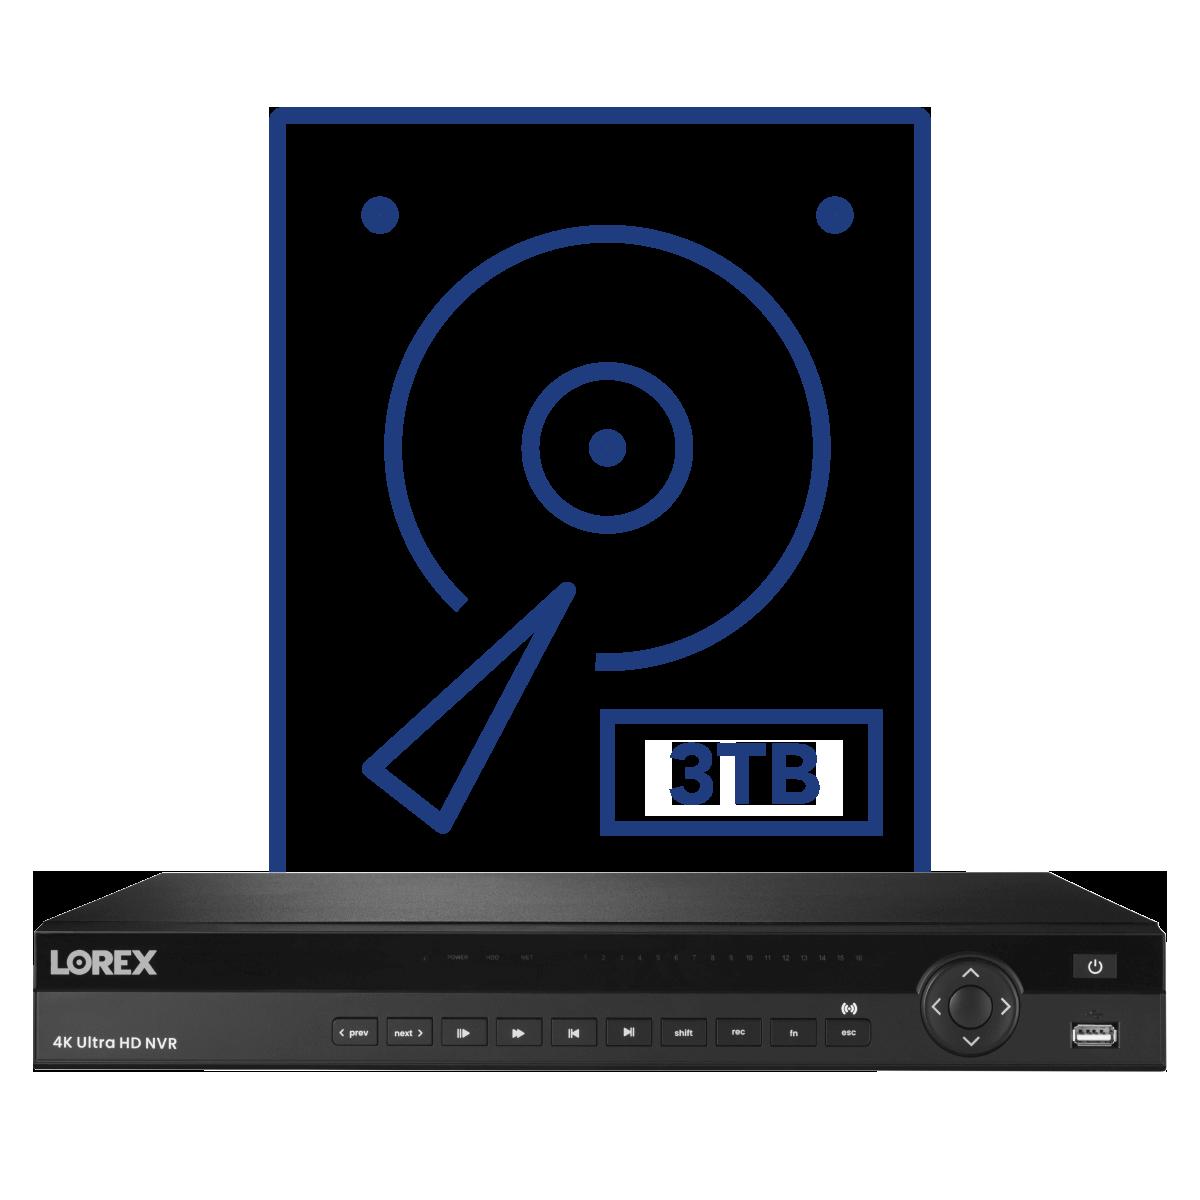 3TB security-grade hard drive